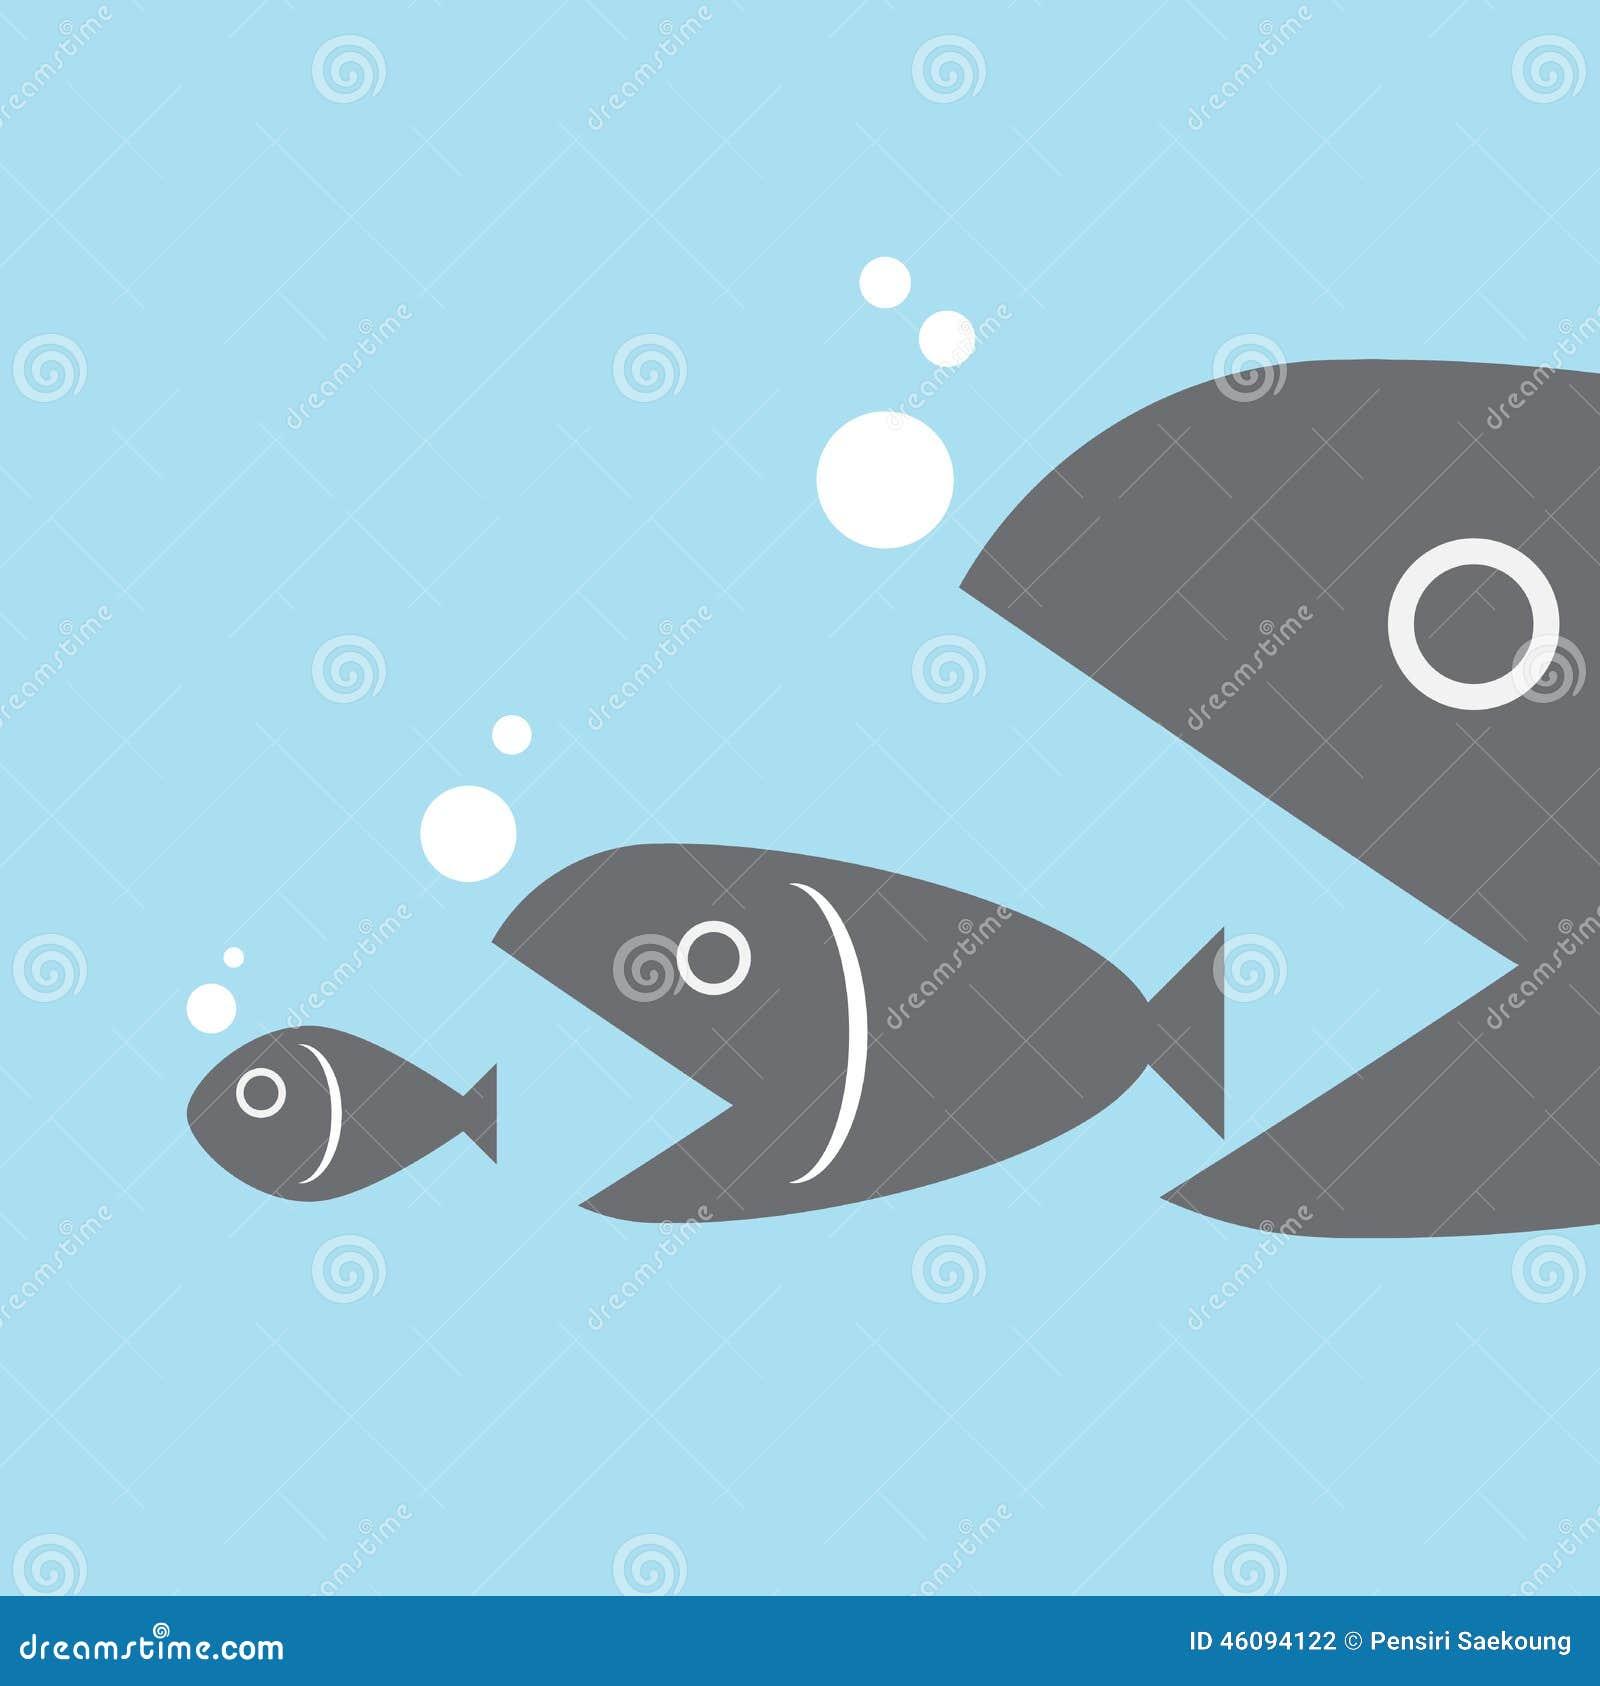 Big Fish Eat Little Fish Stock Vector Illustration Of Bait 46094122